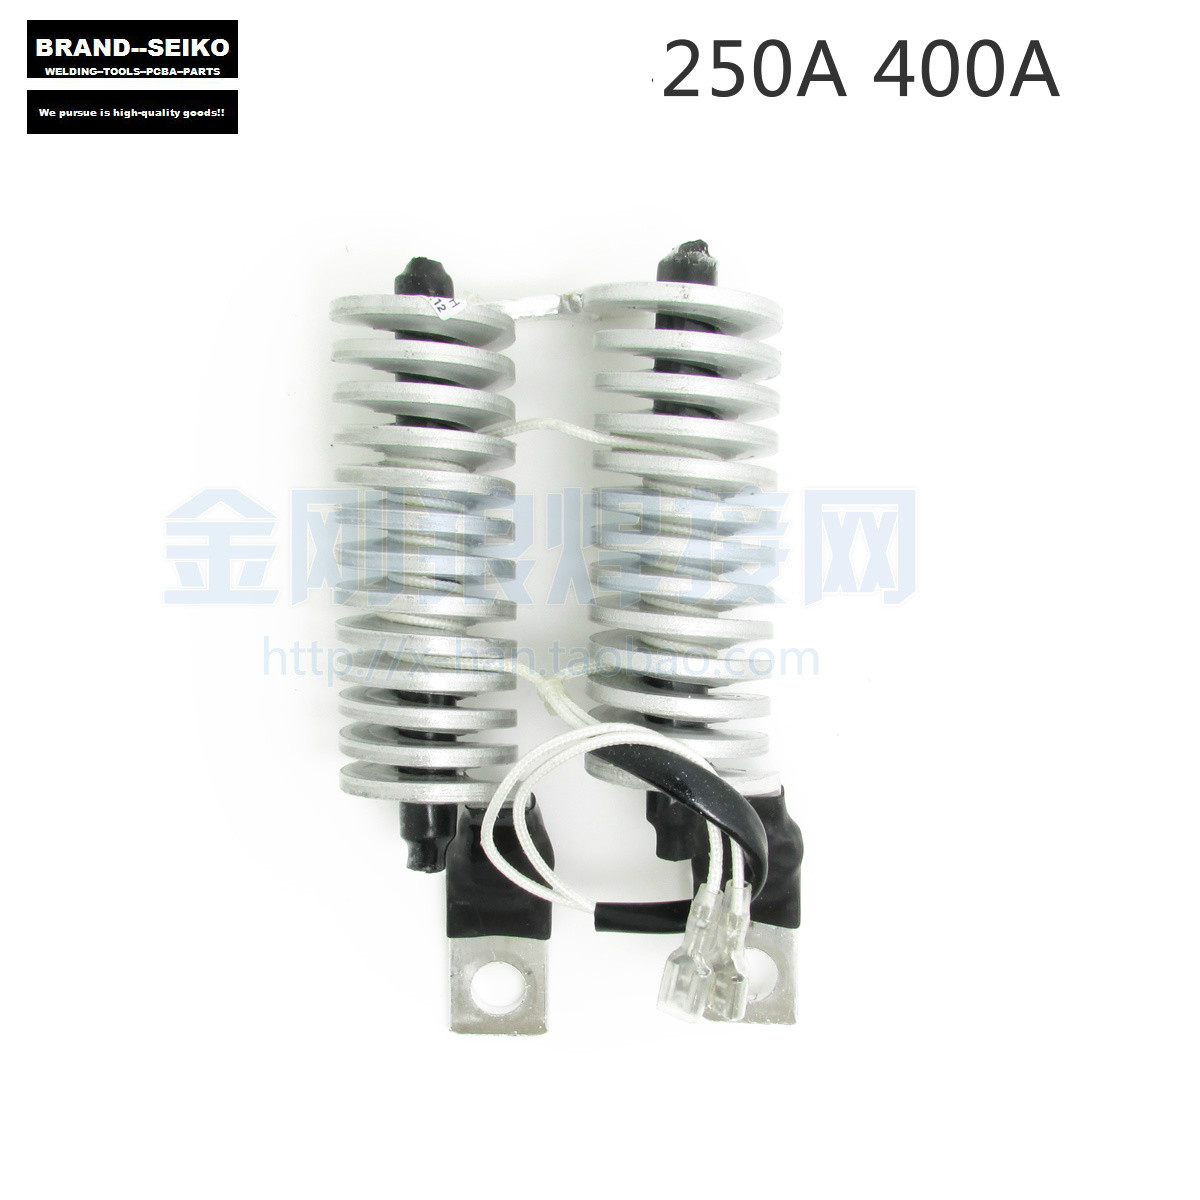 Argon Arc Welding Machine WS250 tig250 Aluminum Arc Ignition 25:12 Arc Ignition Coil Plasma 400a 250a Models  цены